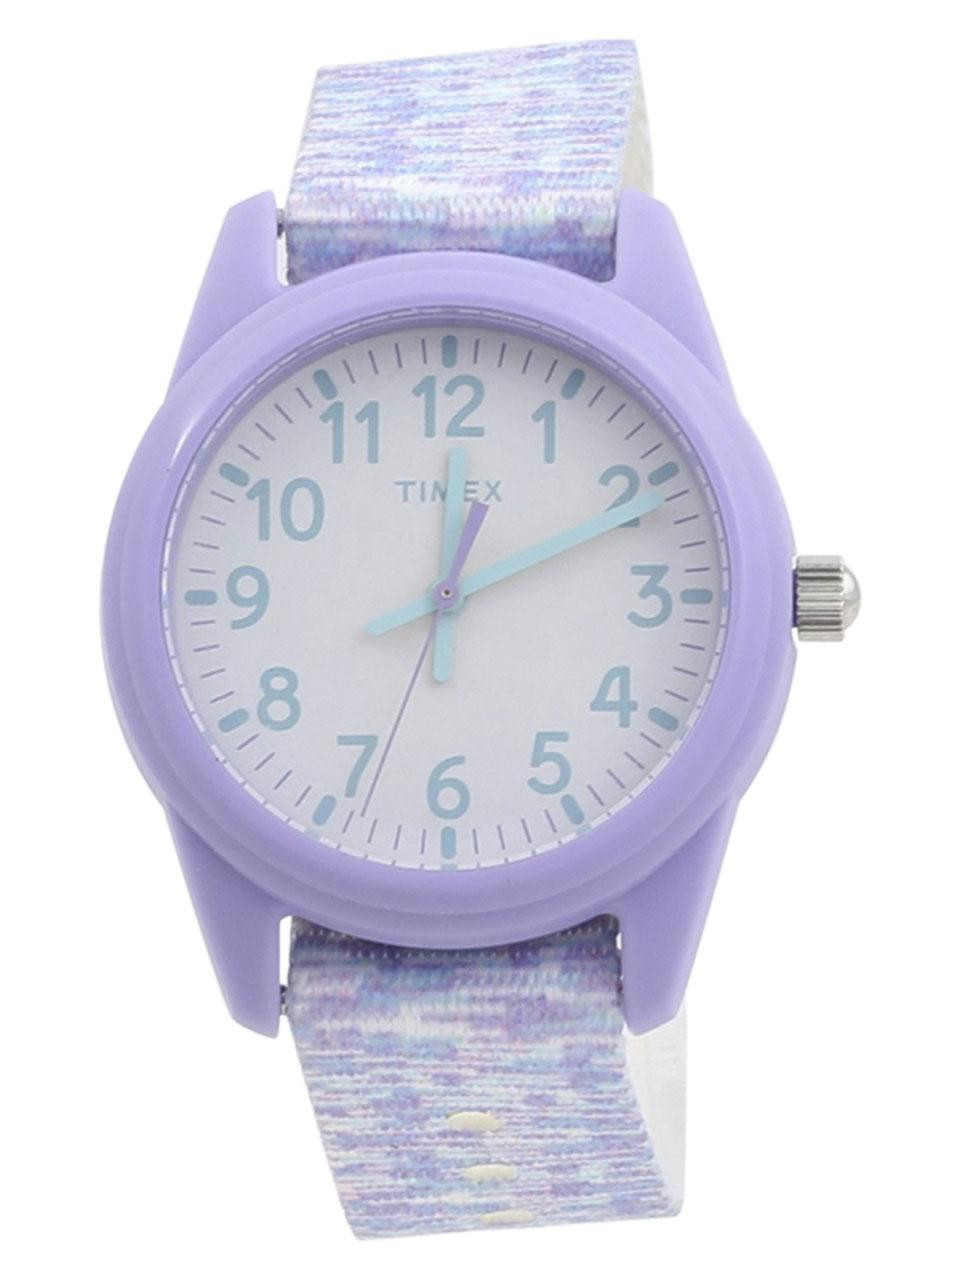 Timex Girl s TW7C12200 Time Machines Purple White Analog Watch